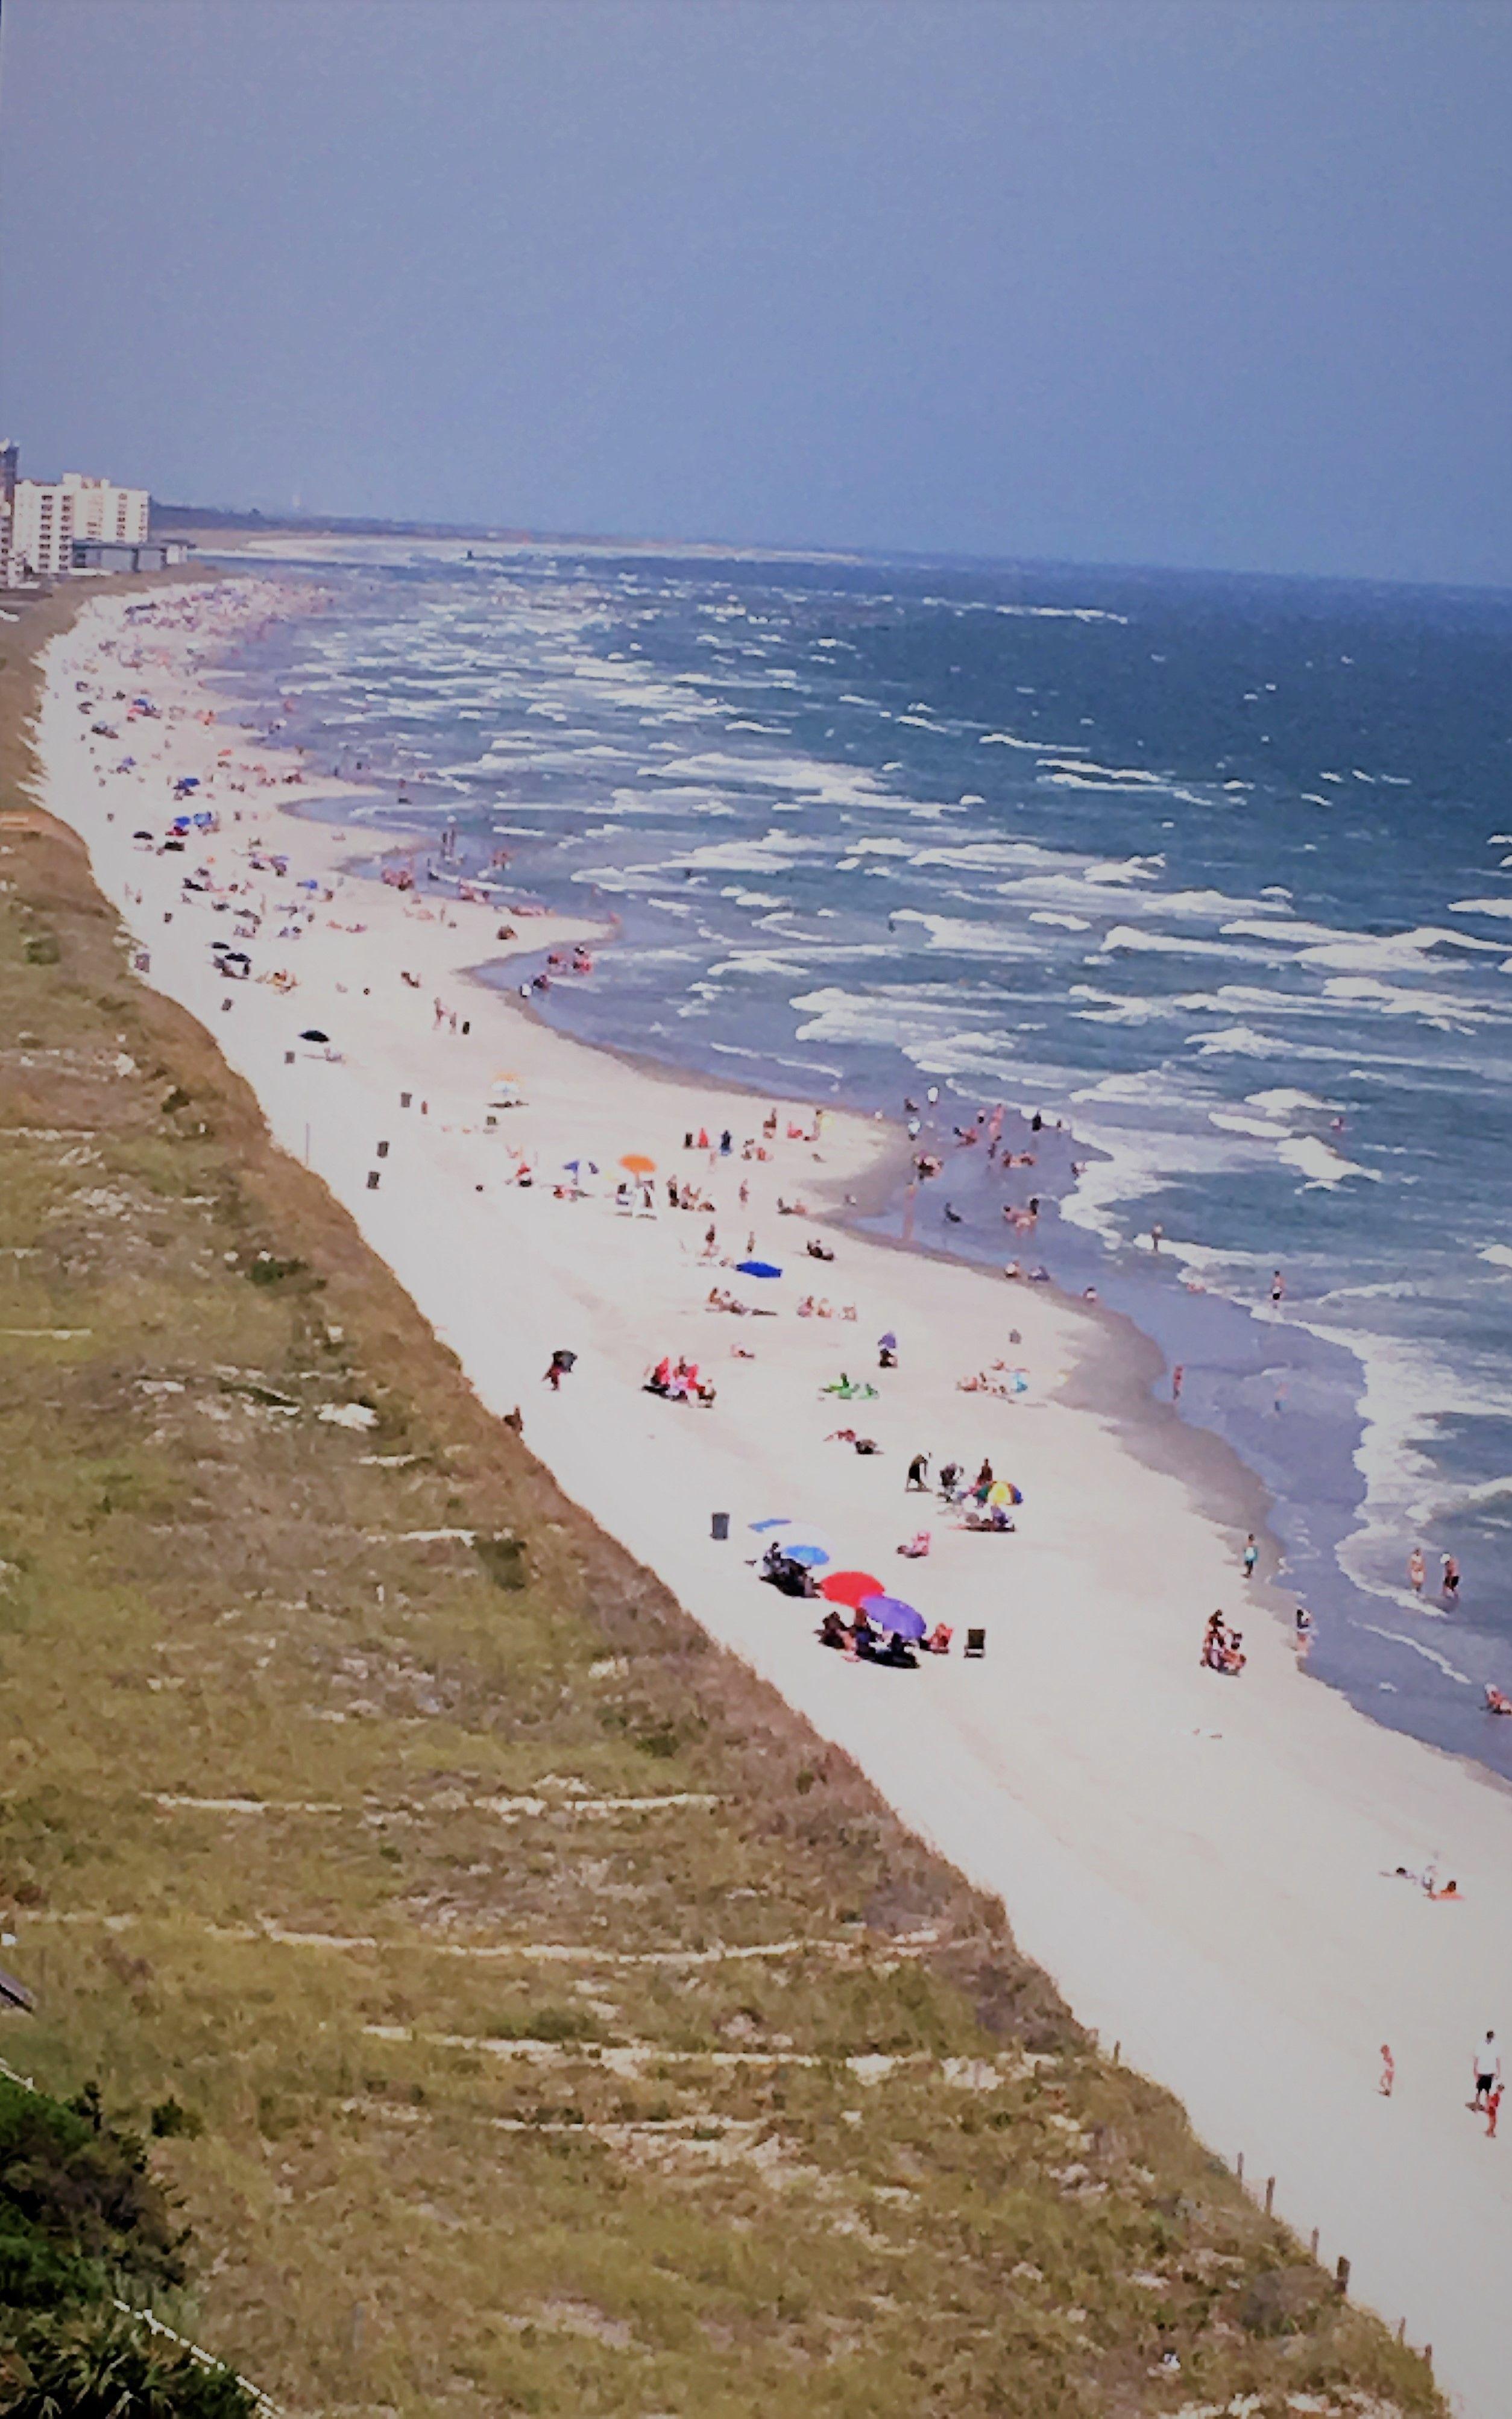 9da1020c40d1eb2c0a02c0ea95e97ad3 - Sea Gardens North Myrtle Beach South Carolina